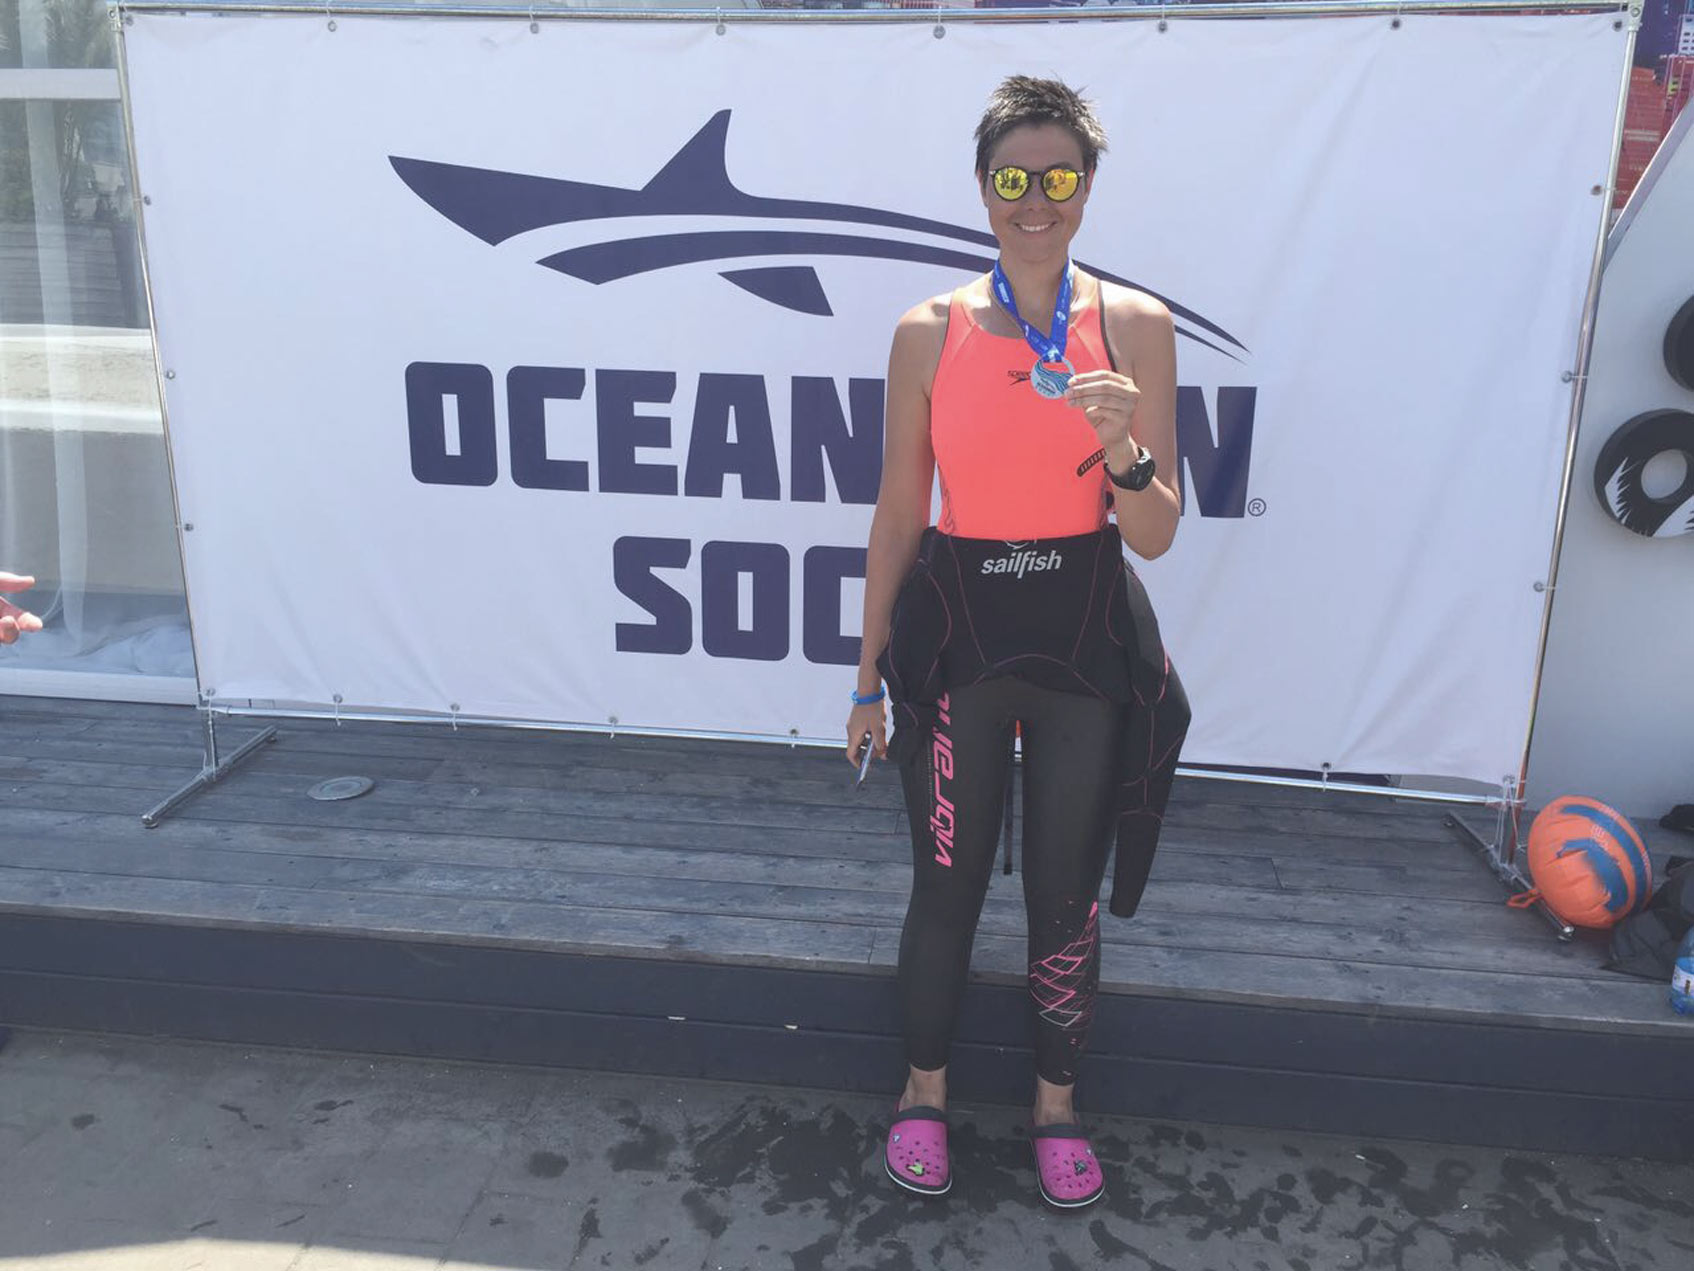 OceanmanSochi дистанция